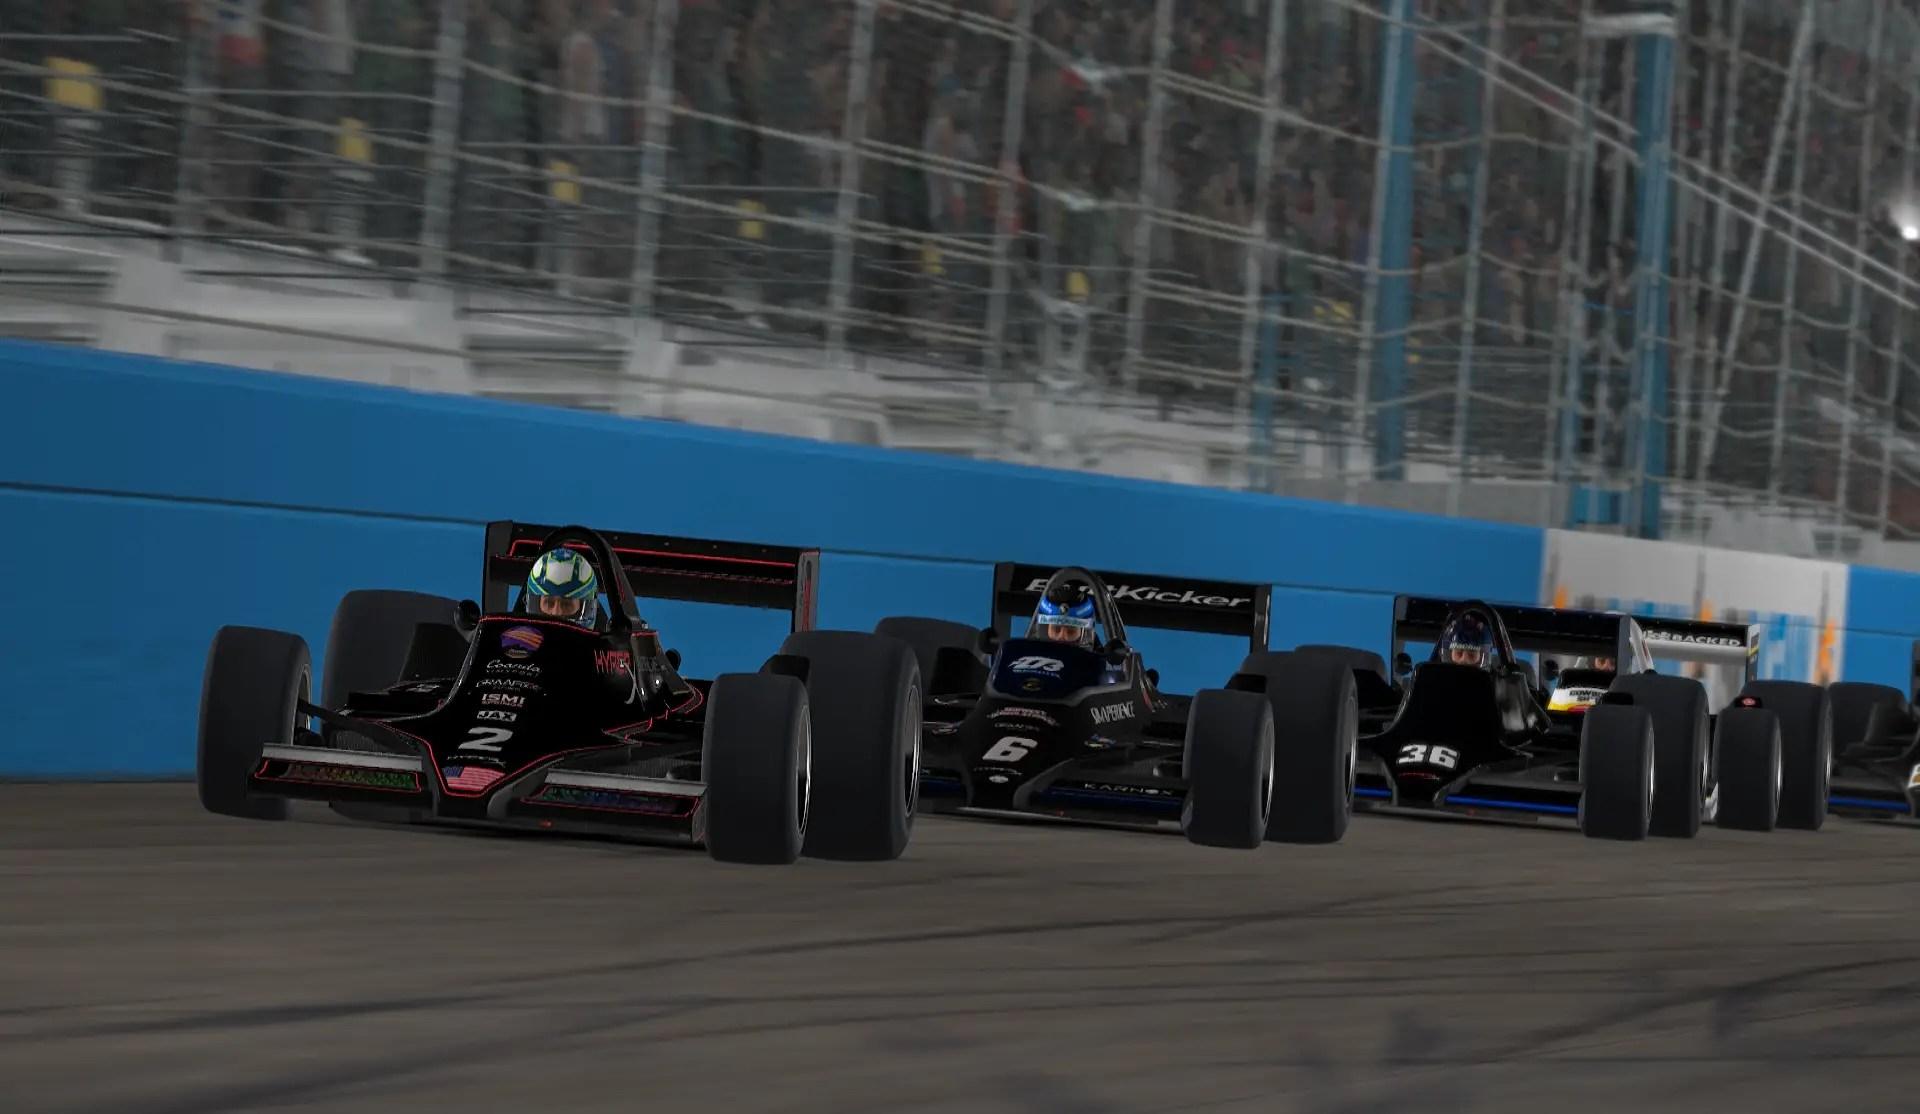 iRacing Lionheart Retro Series Round 4 GP Of Mosport